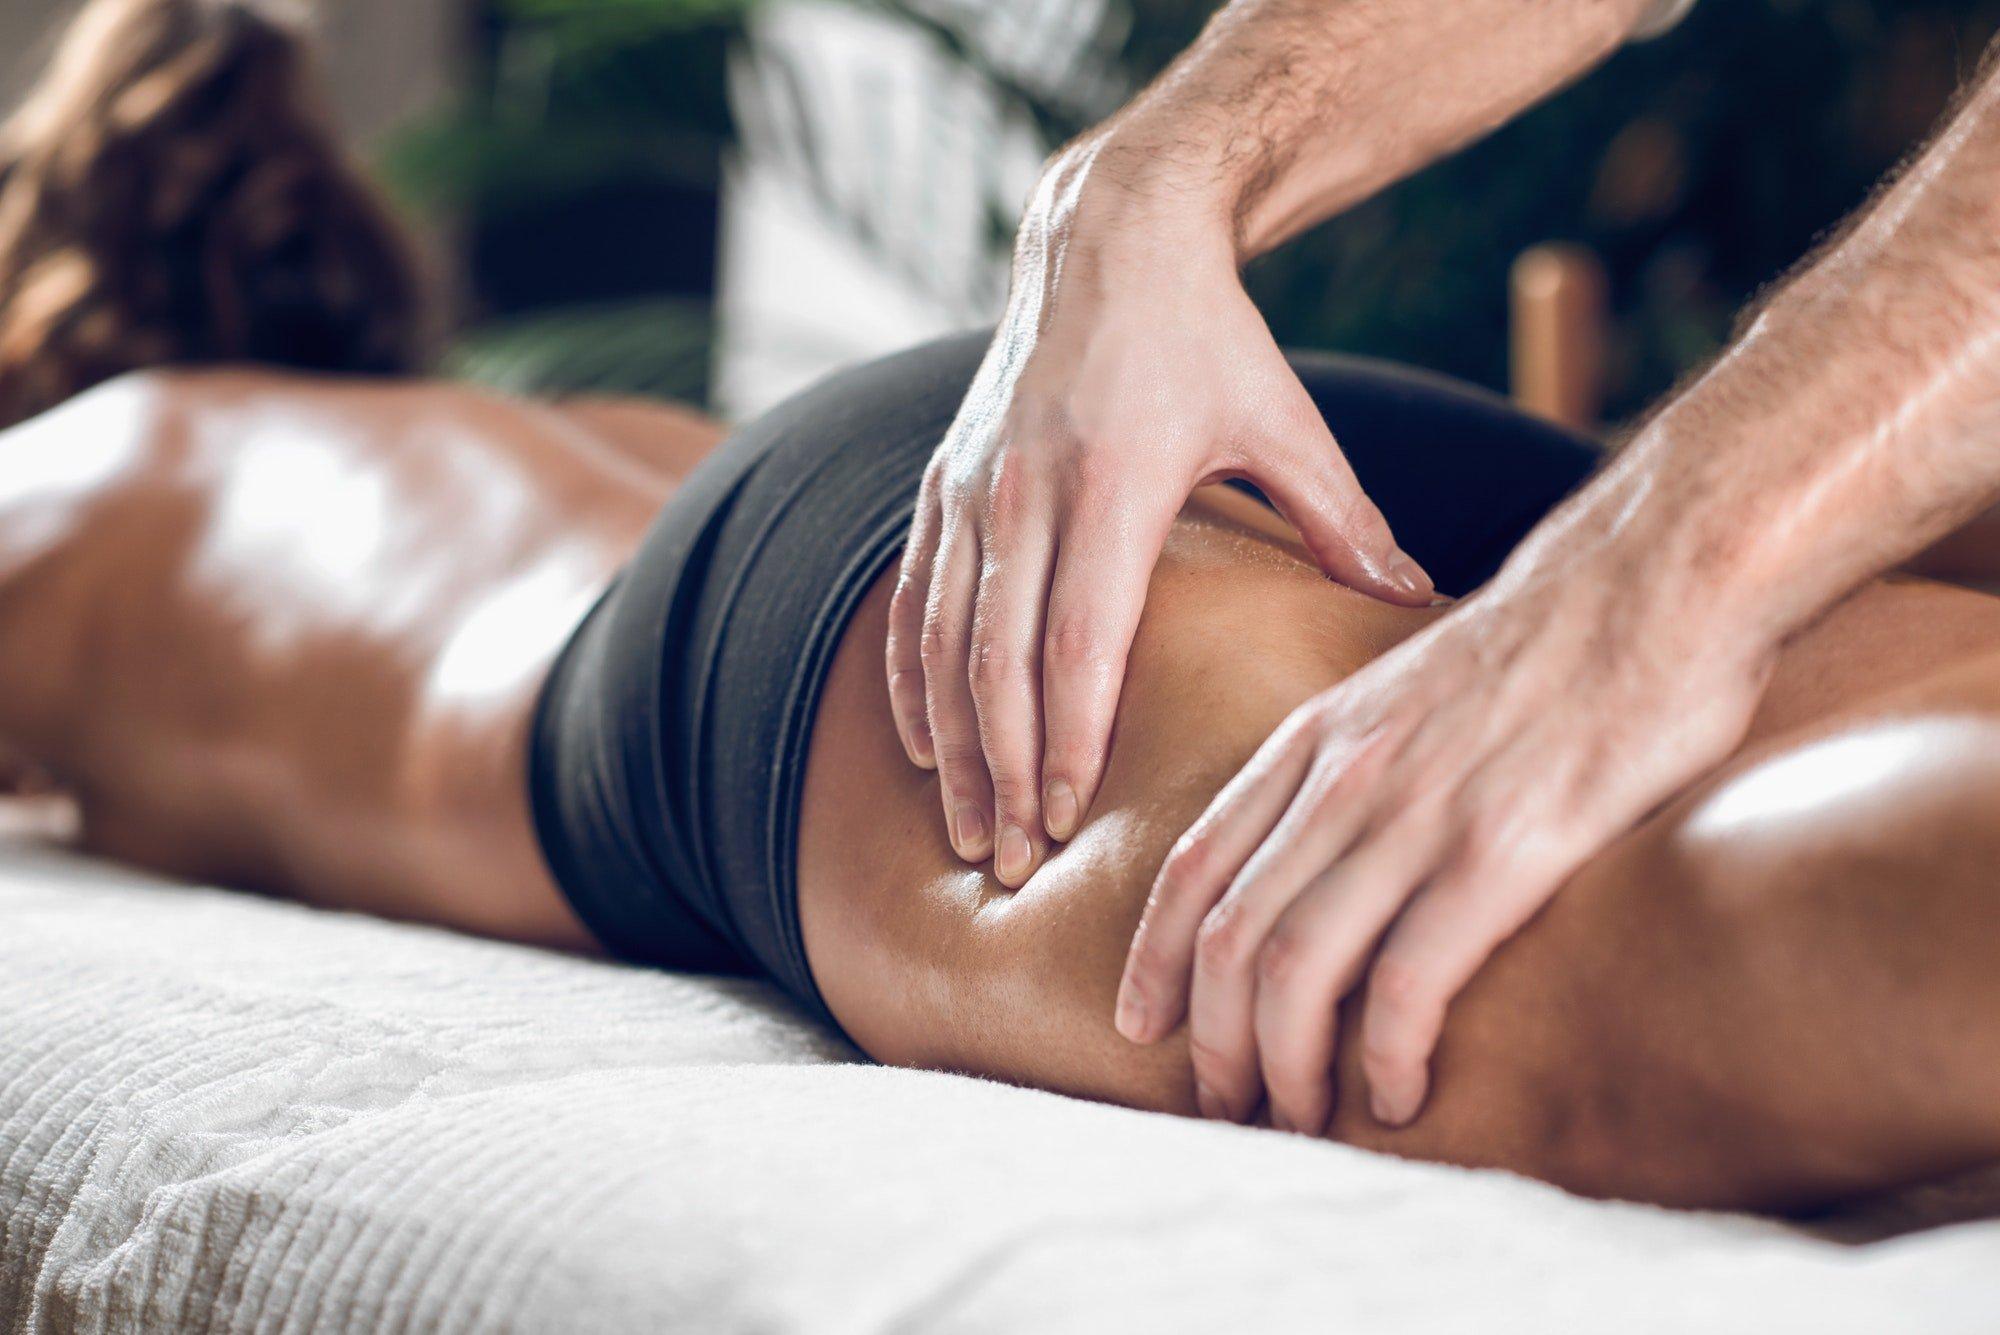 4 Hand Massage: The Ultimate Tantric Indulgence | SaveDelete